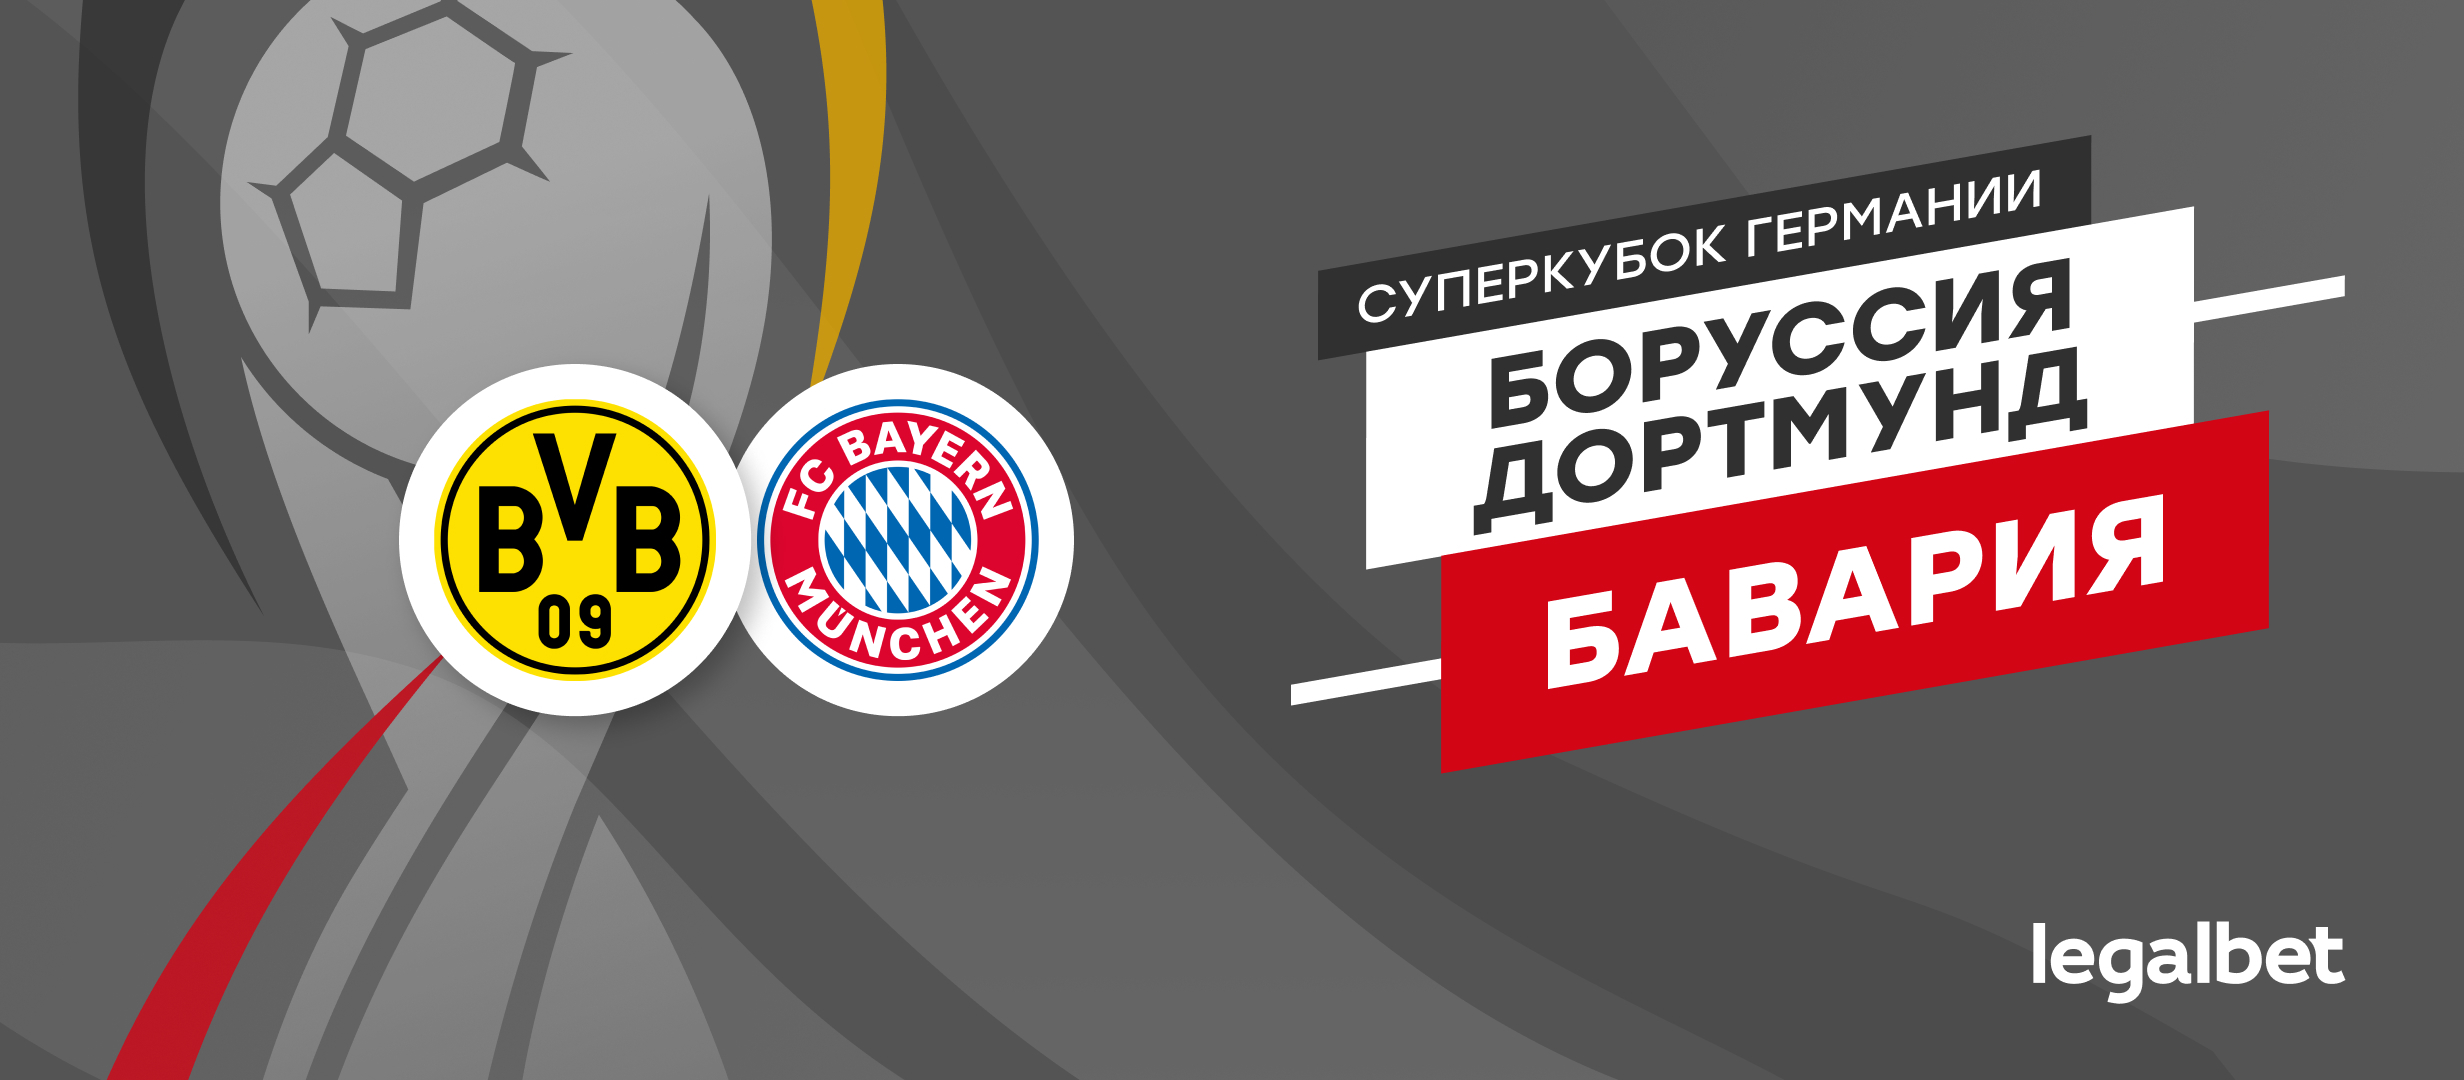 «Боруссия» Дортмунд — «Бавария»: ставки и коэффициенты на матч